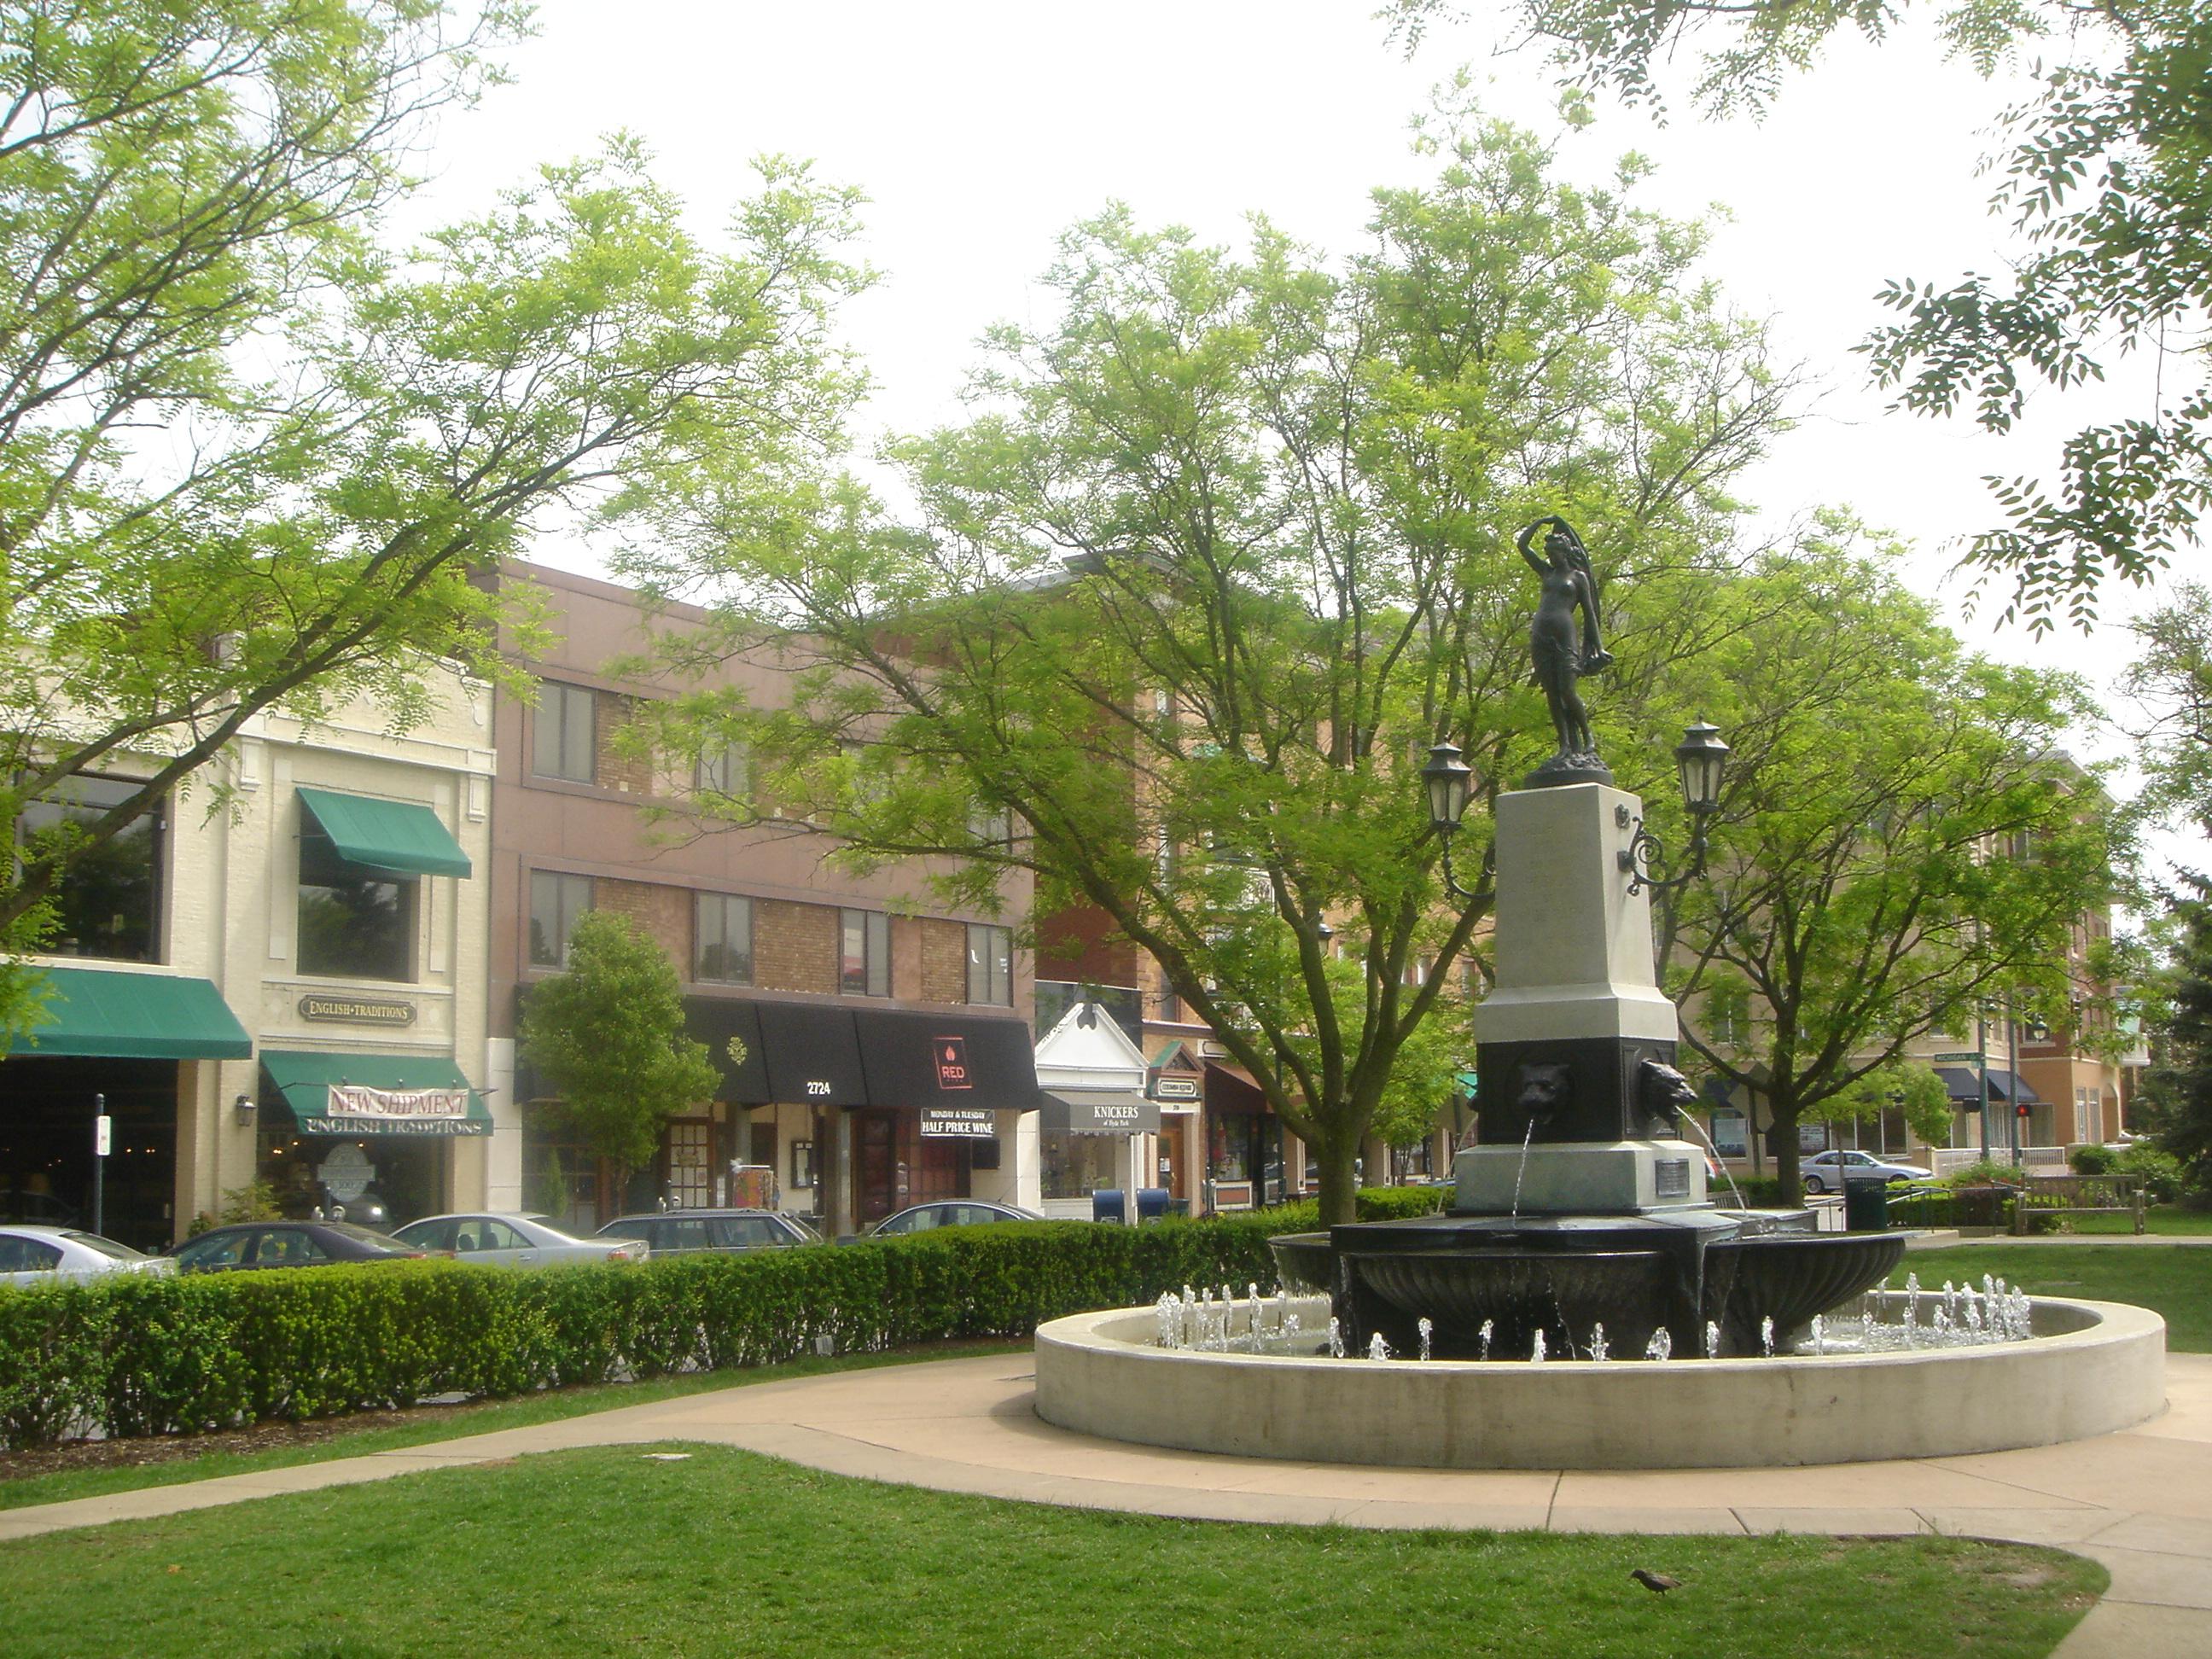 Hyde Park - photos - cincy.com  |Hyde Park Square Cincinnati Ohio